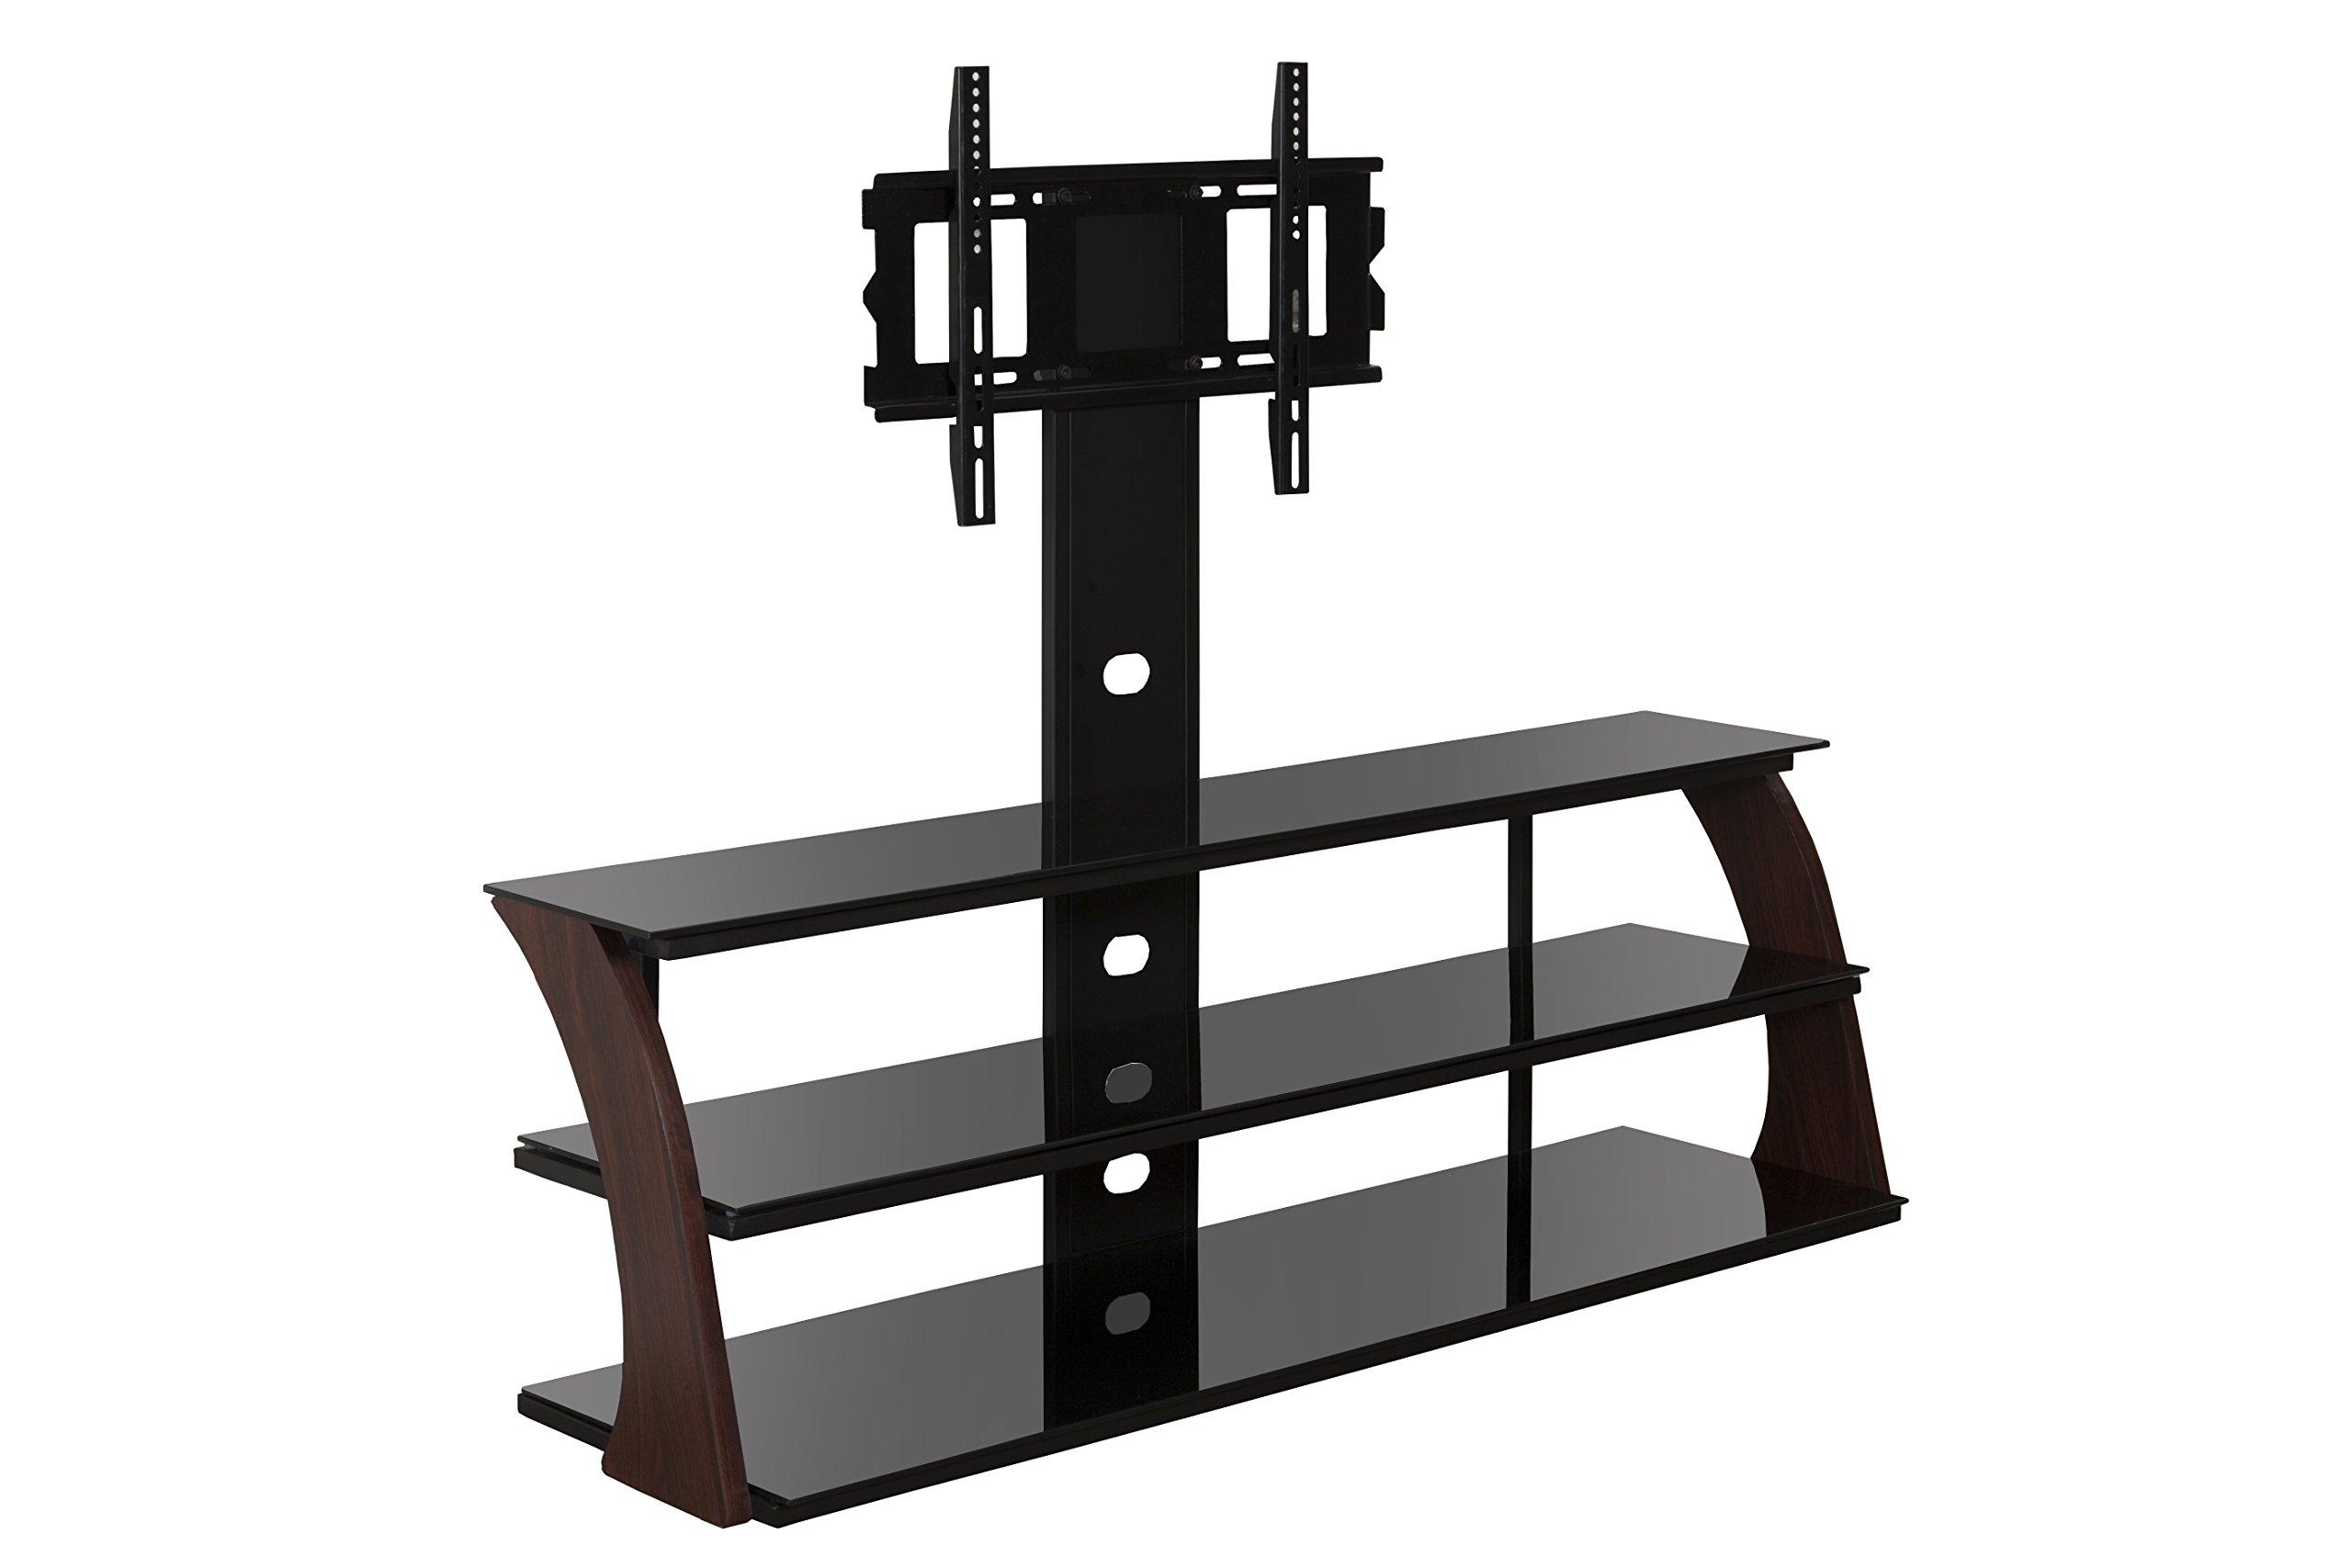 Sandberg Furniture Abigail TV Stand with Mount, Walnut/Black